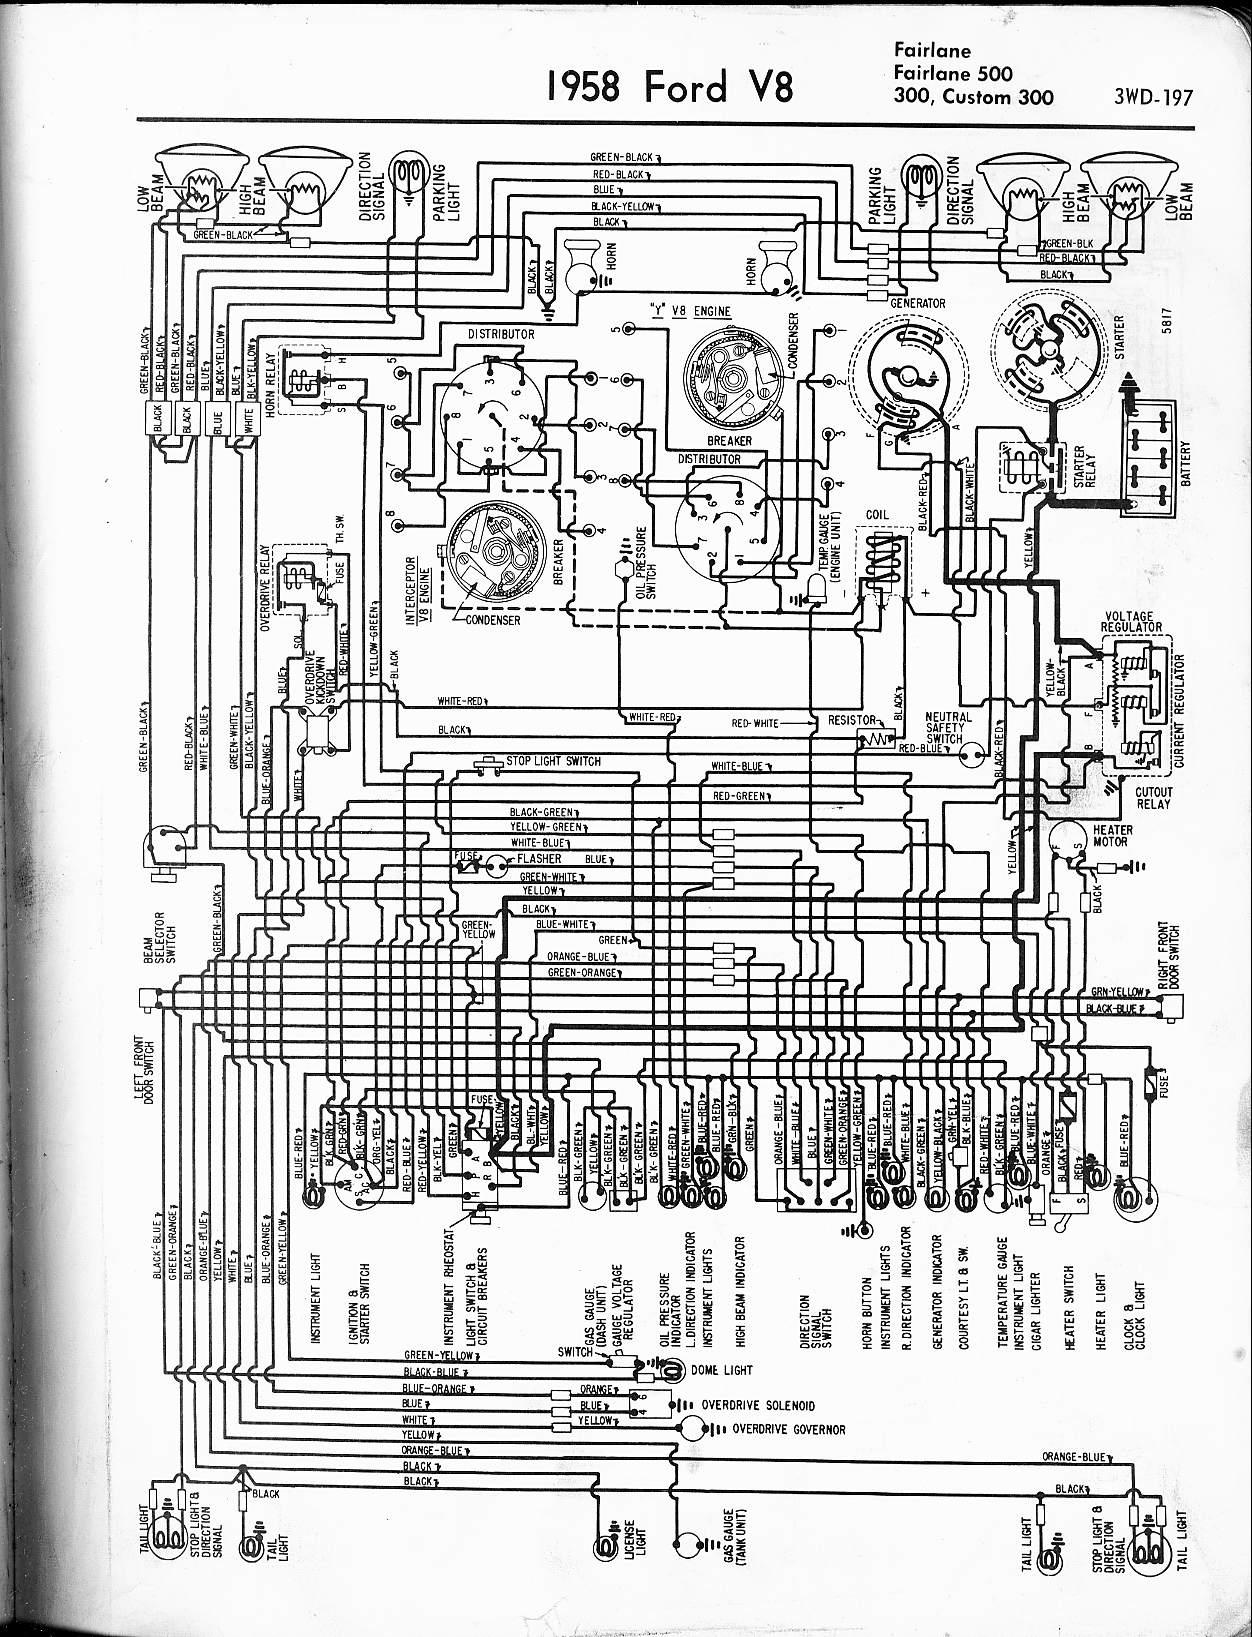 Brilliant 1966 Ford Thunderbird Wiring Diagram Wiring Diagram Database Wiring Cloud Staixaidewilluminateatxorg